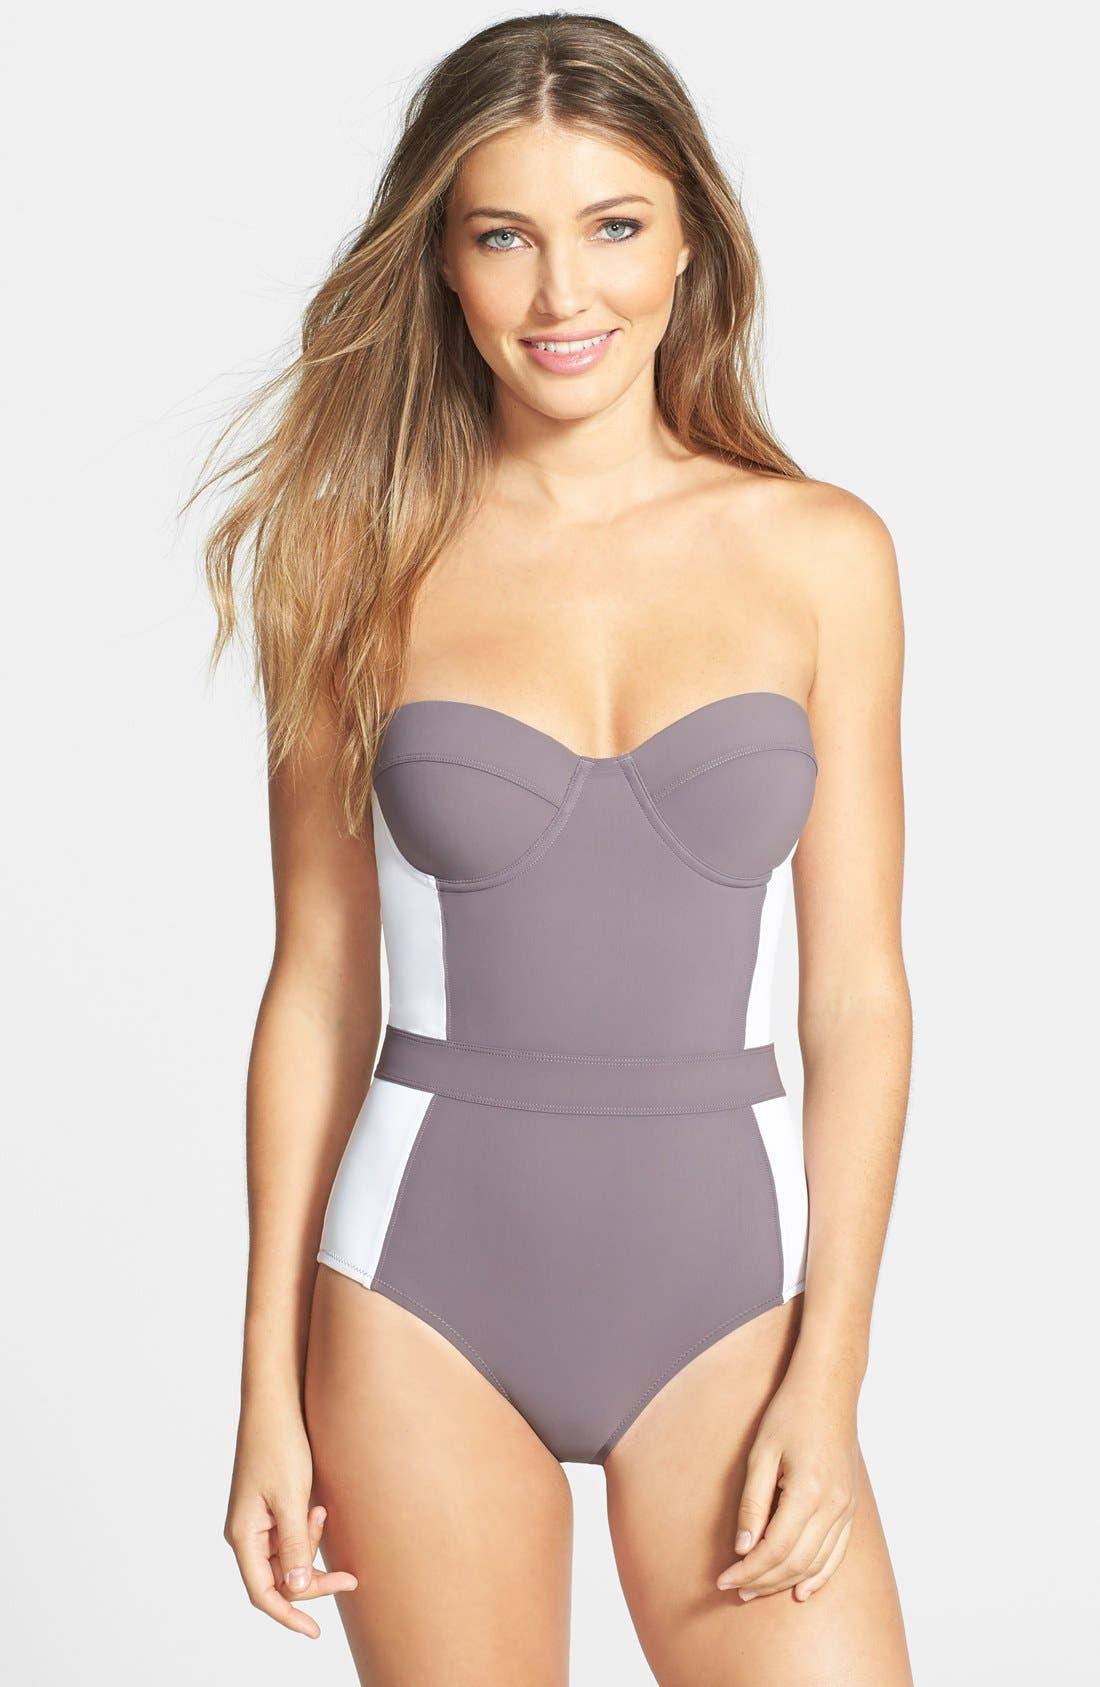 Alternate Image 1 Selected - Tory Burch 'Lipsi' Colorblock One-Piece Swimsuit